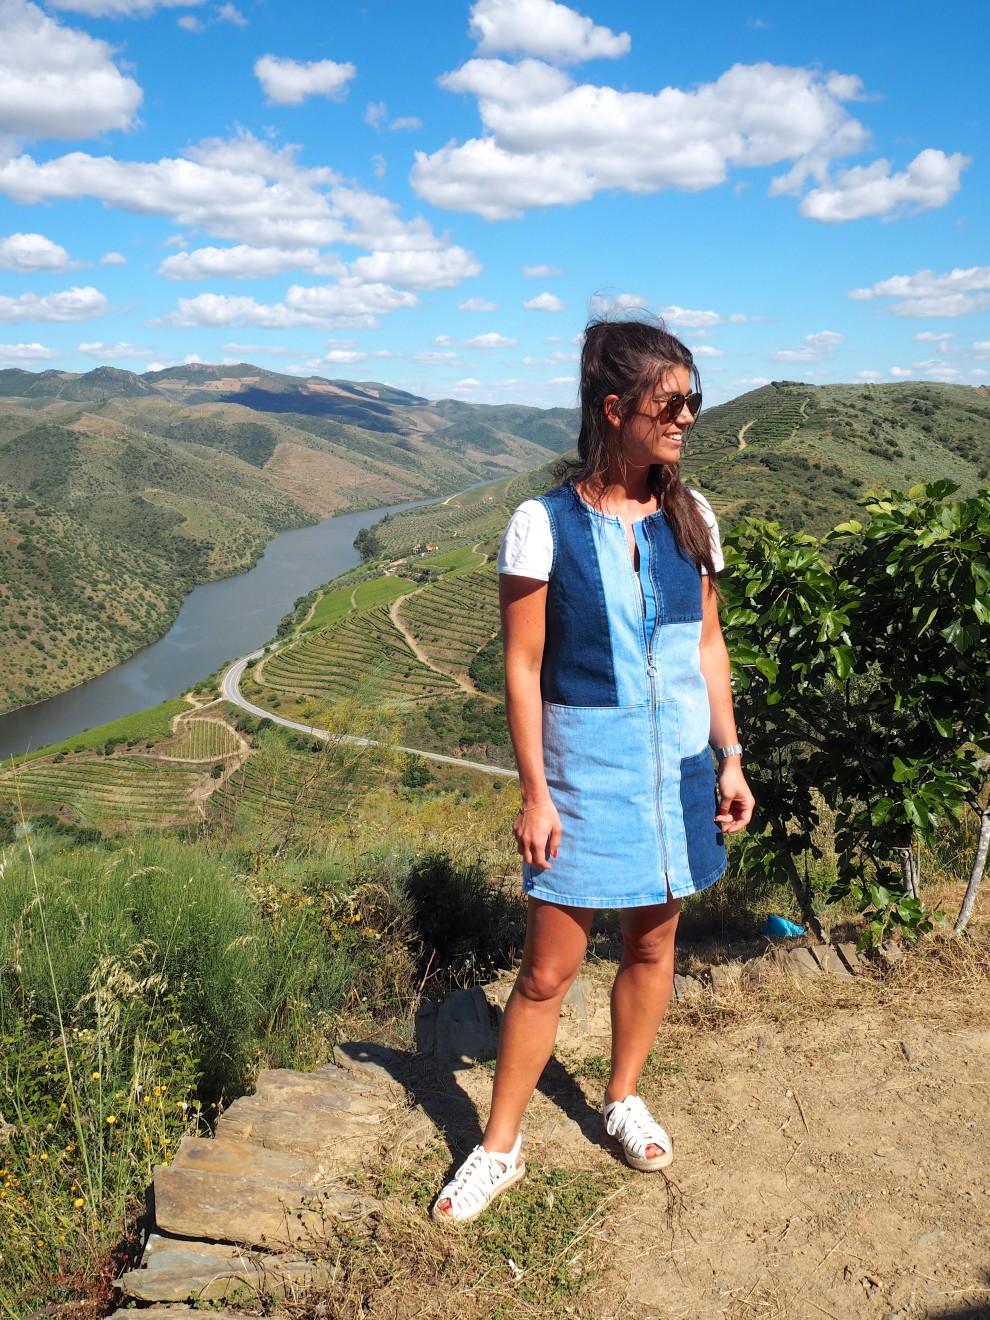 PORTUGAL ROADTRIP: Furadoura - Côa Valley